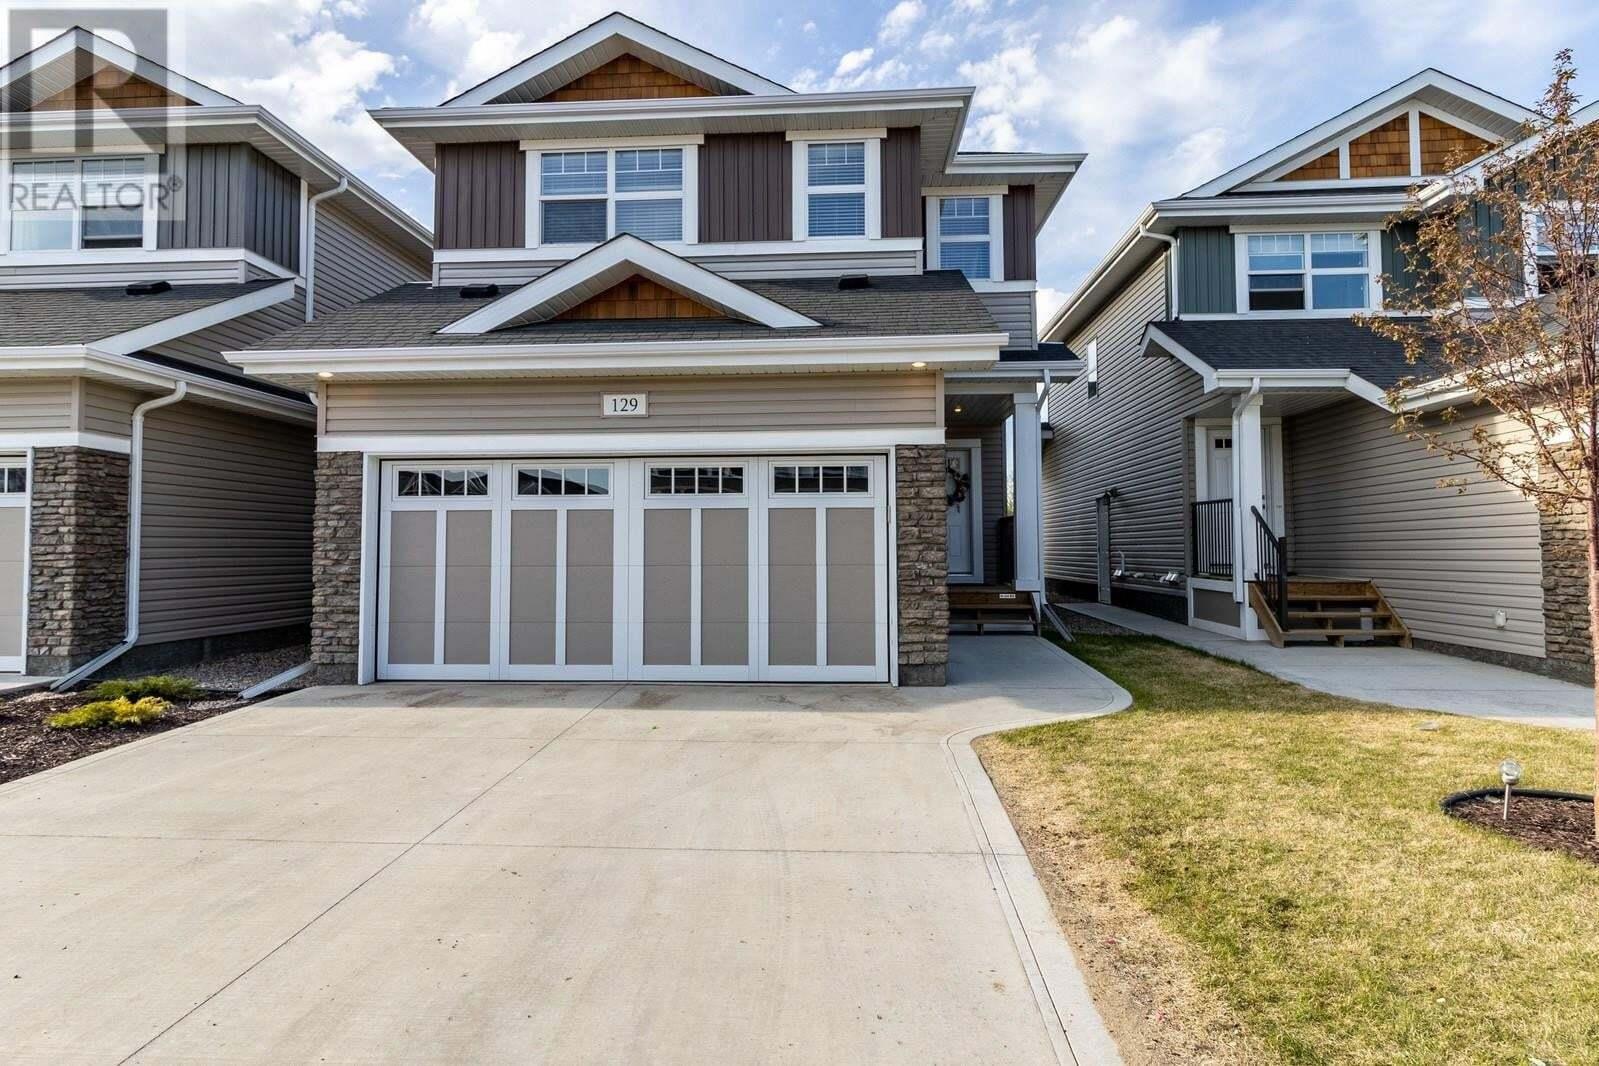 House for sale at 315 Dickson Cres Unit 129 Saskatoon Saskatchewan - MLS: SK809532